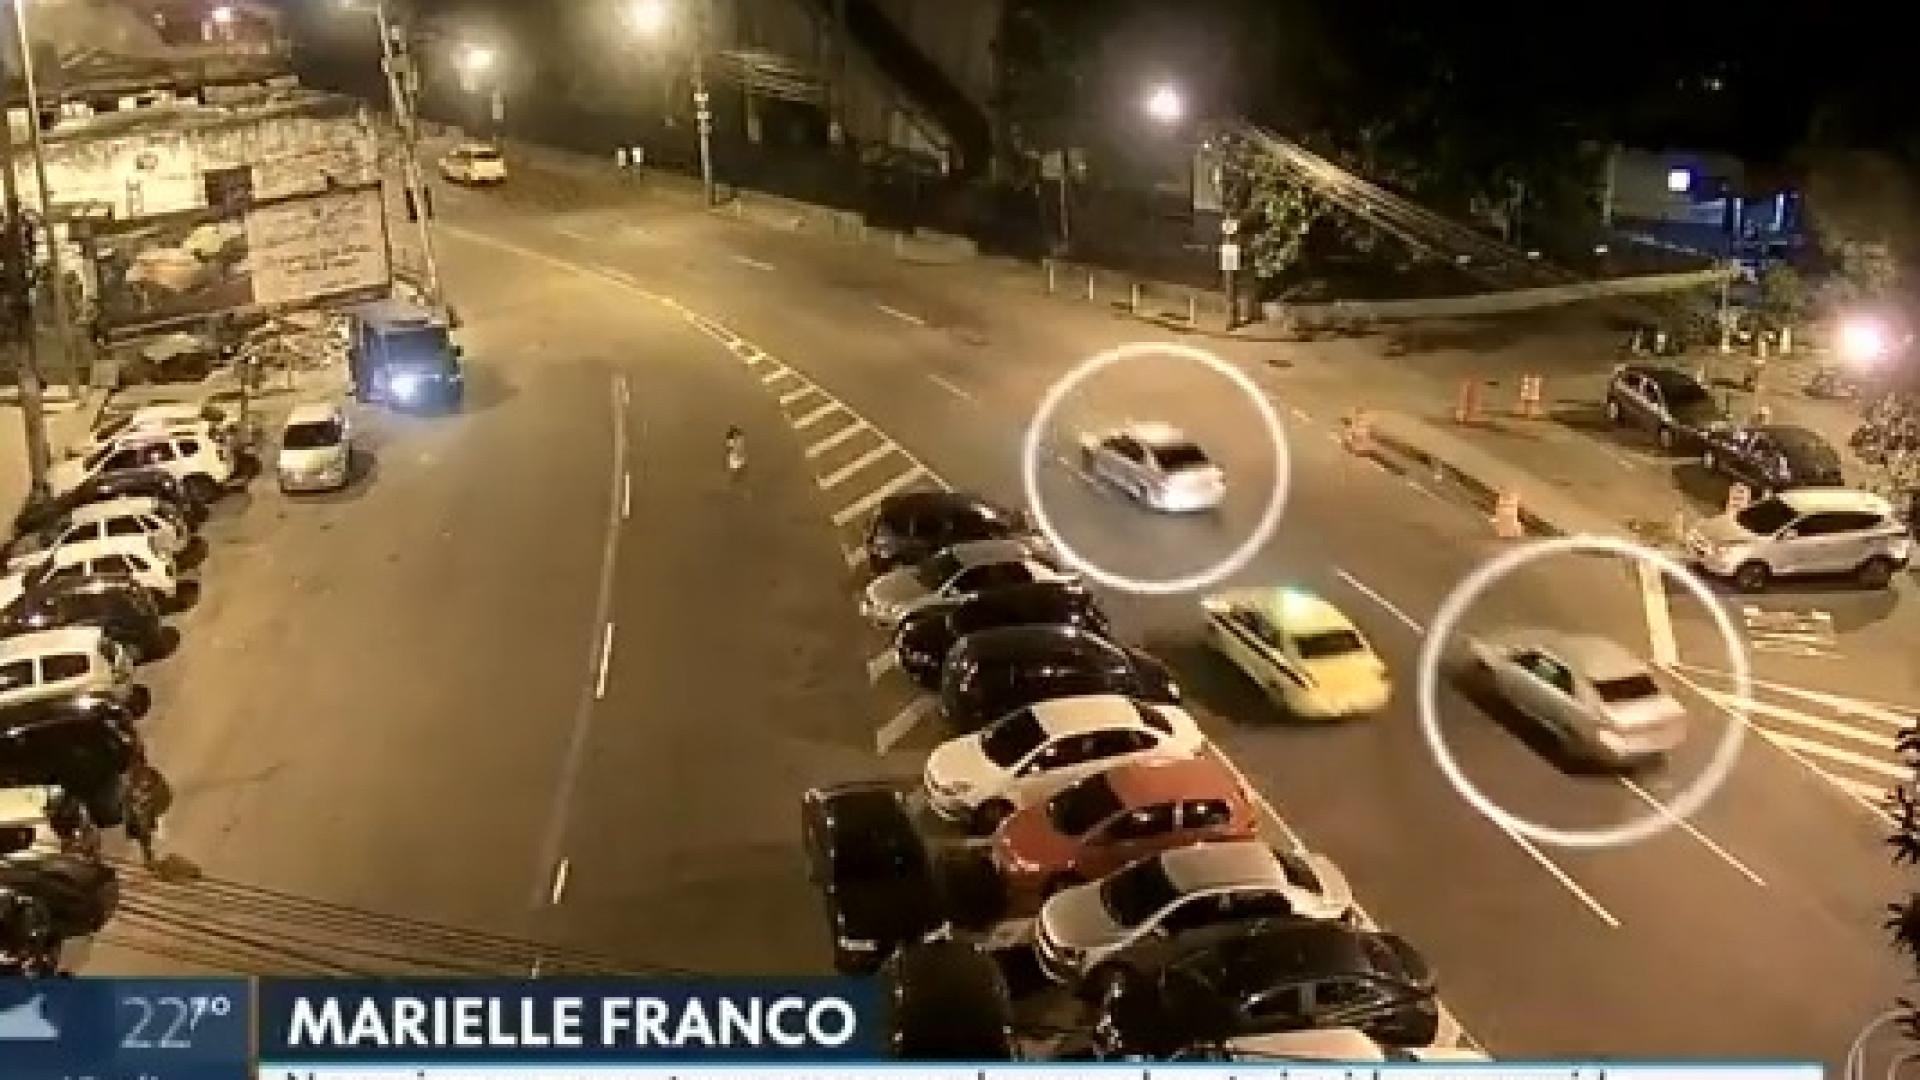 Imagens mostram carro de Marielle Franco a ser perseguido